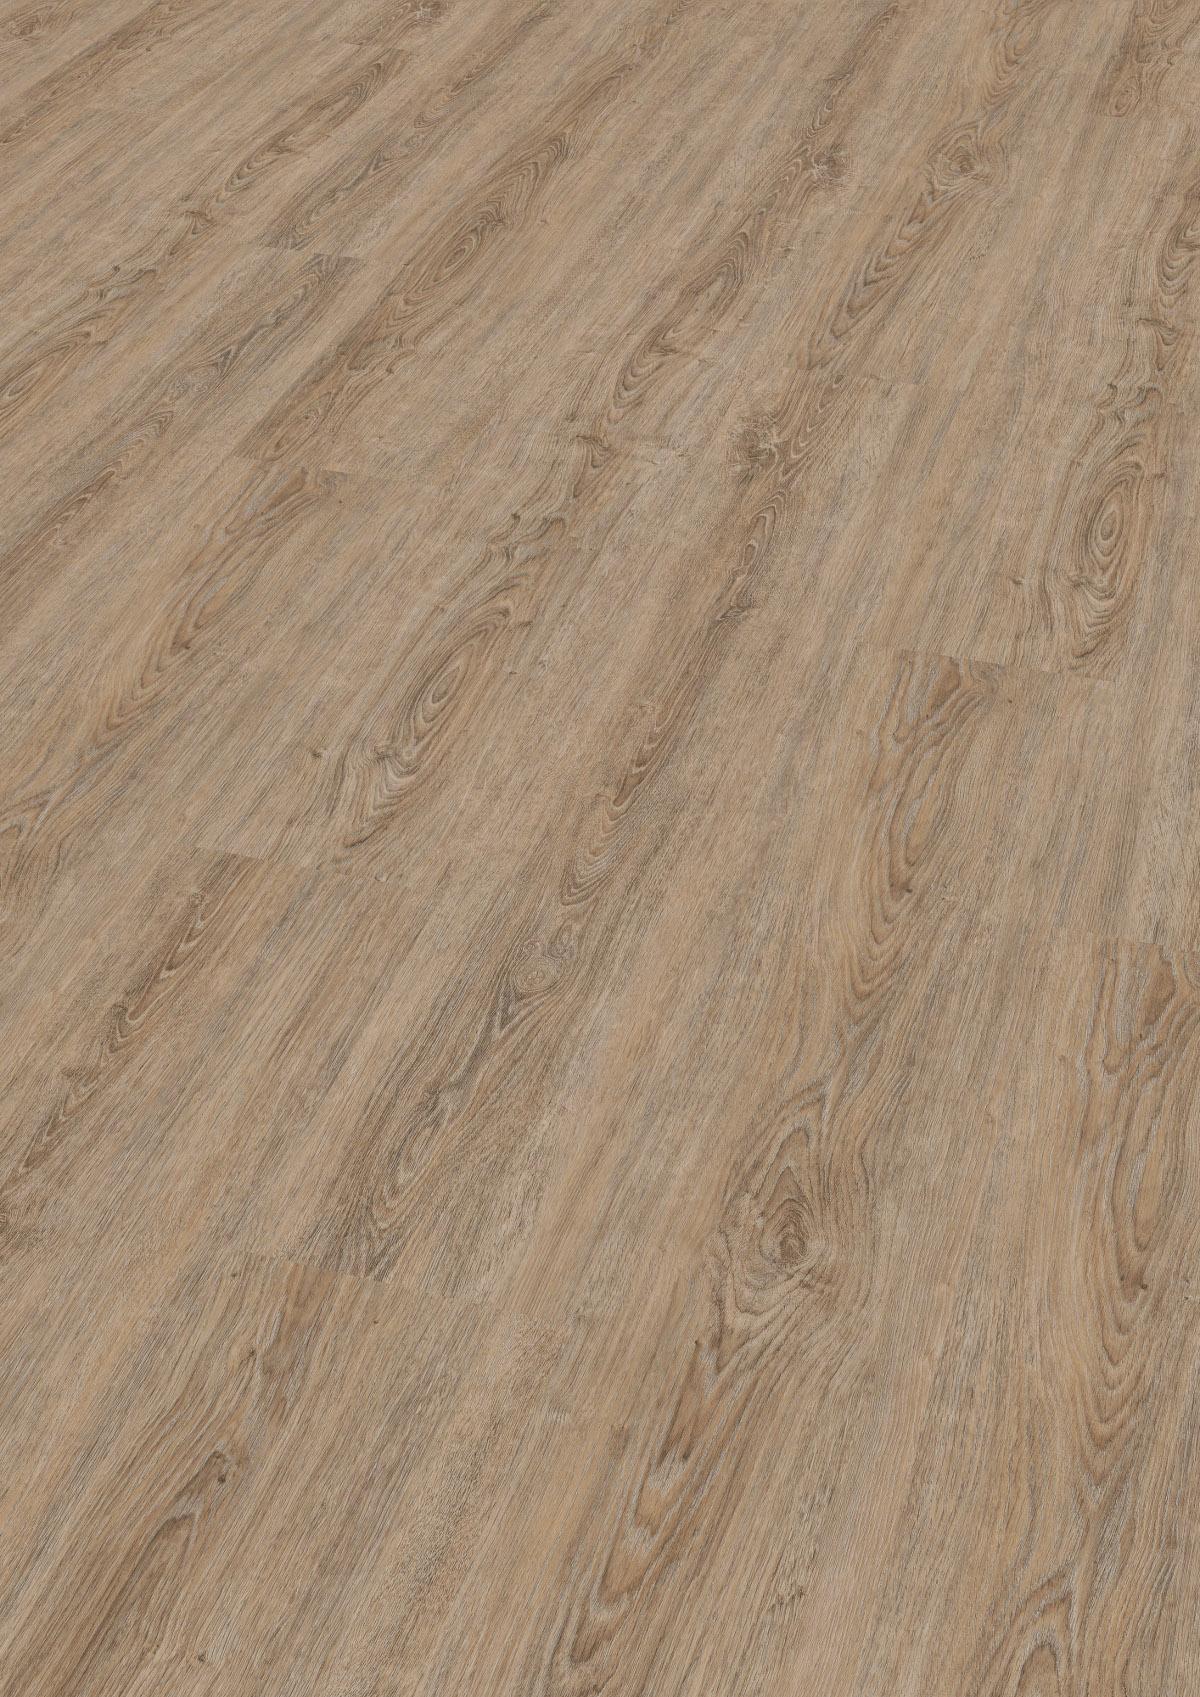 wineo vinyl 5 mm klick clay calm oak wineo 800 wood xl. Black Bedroom Furniture Sets. Home Design Ideas